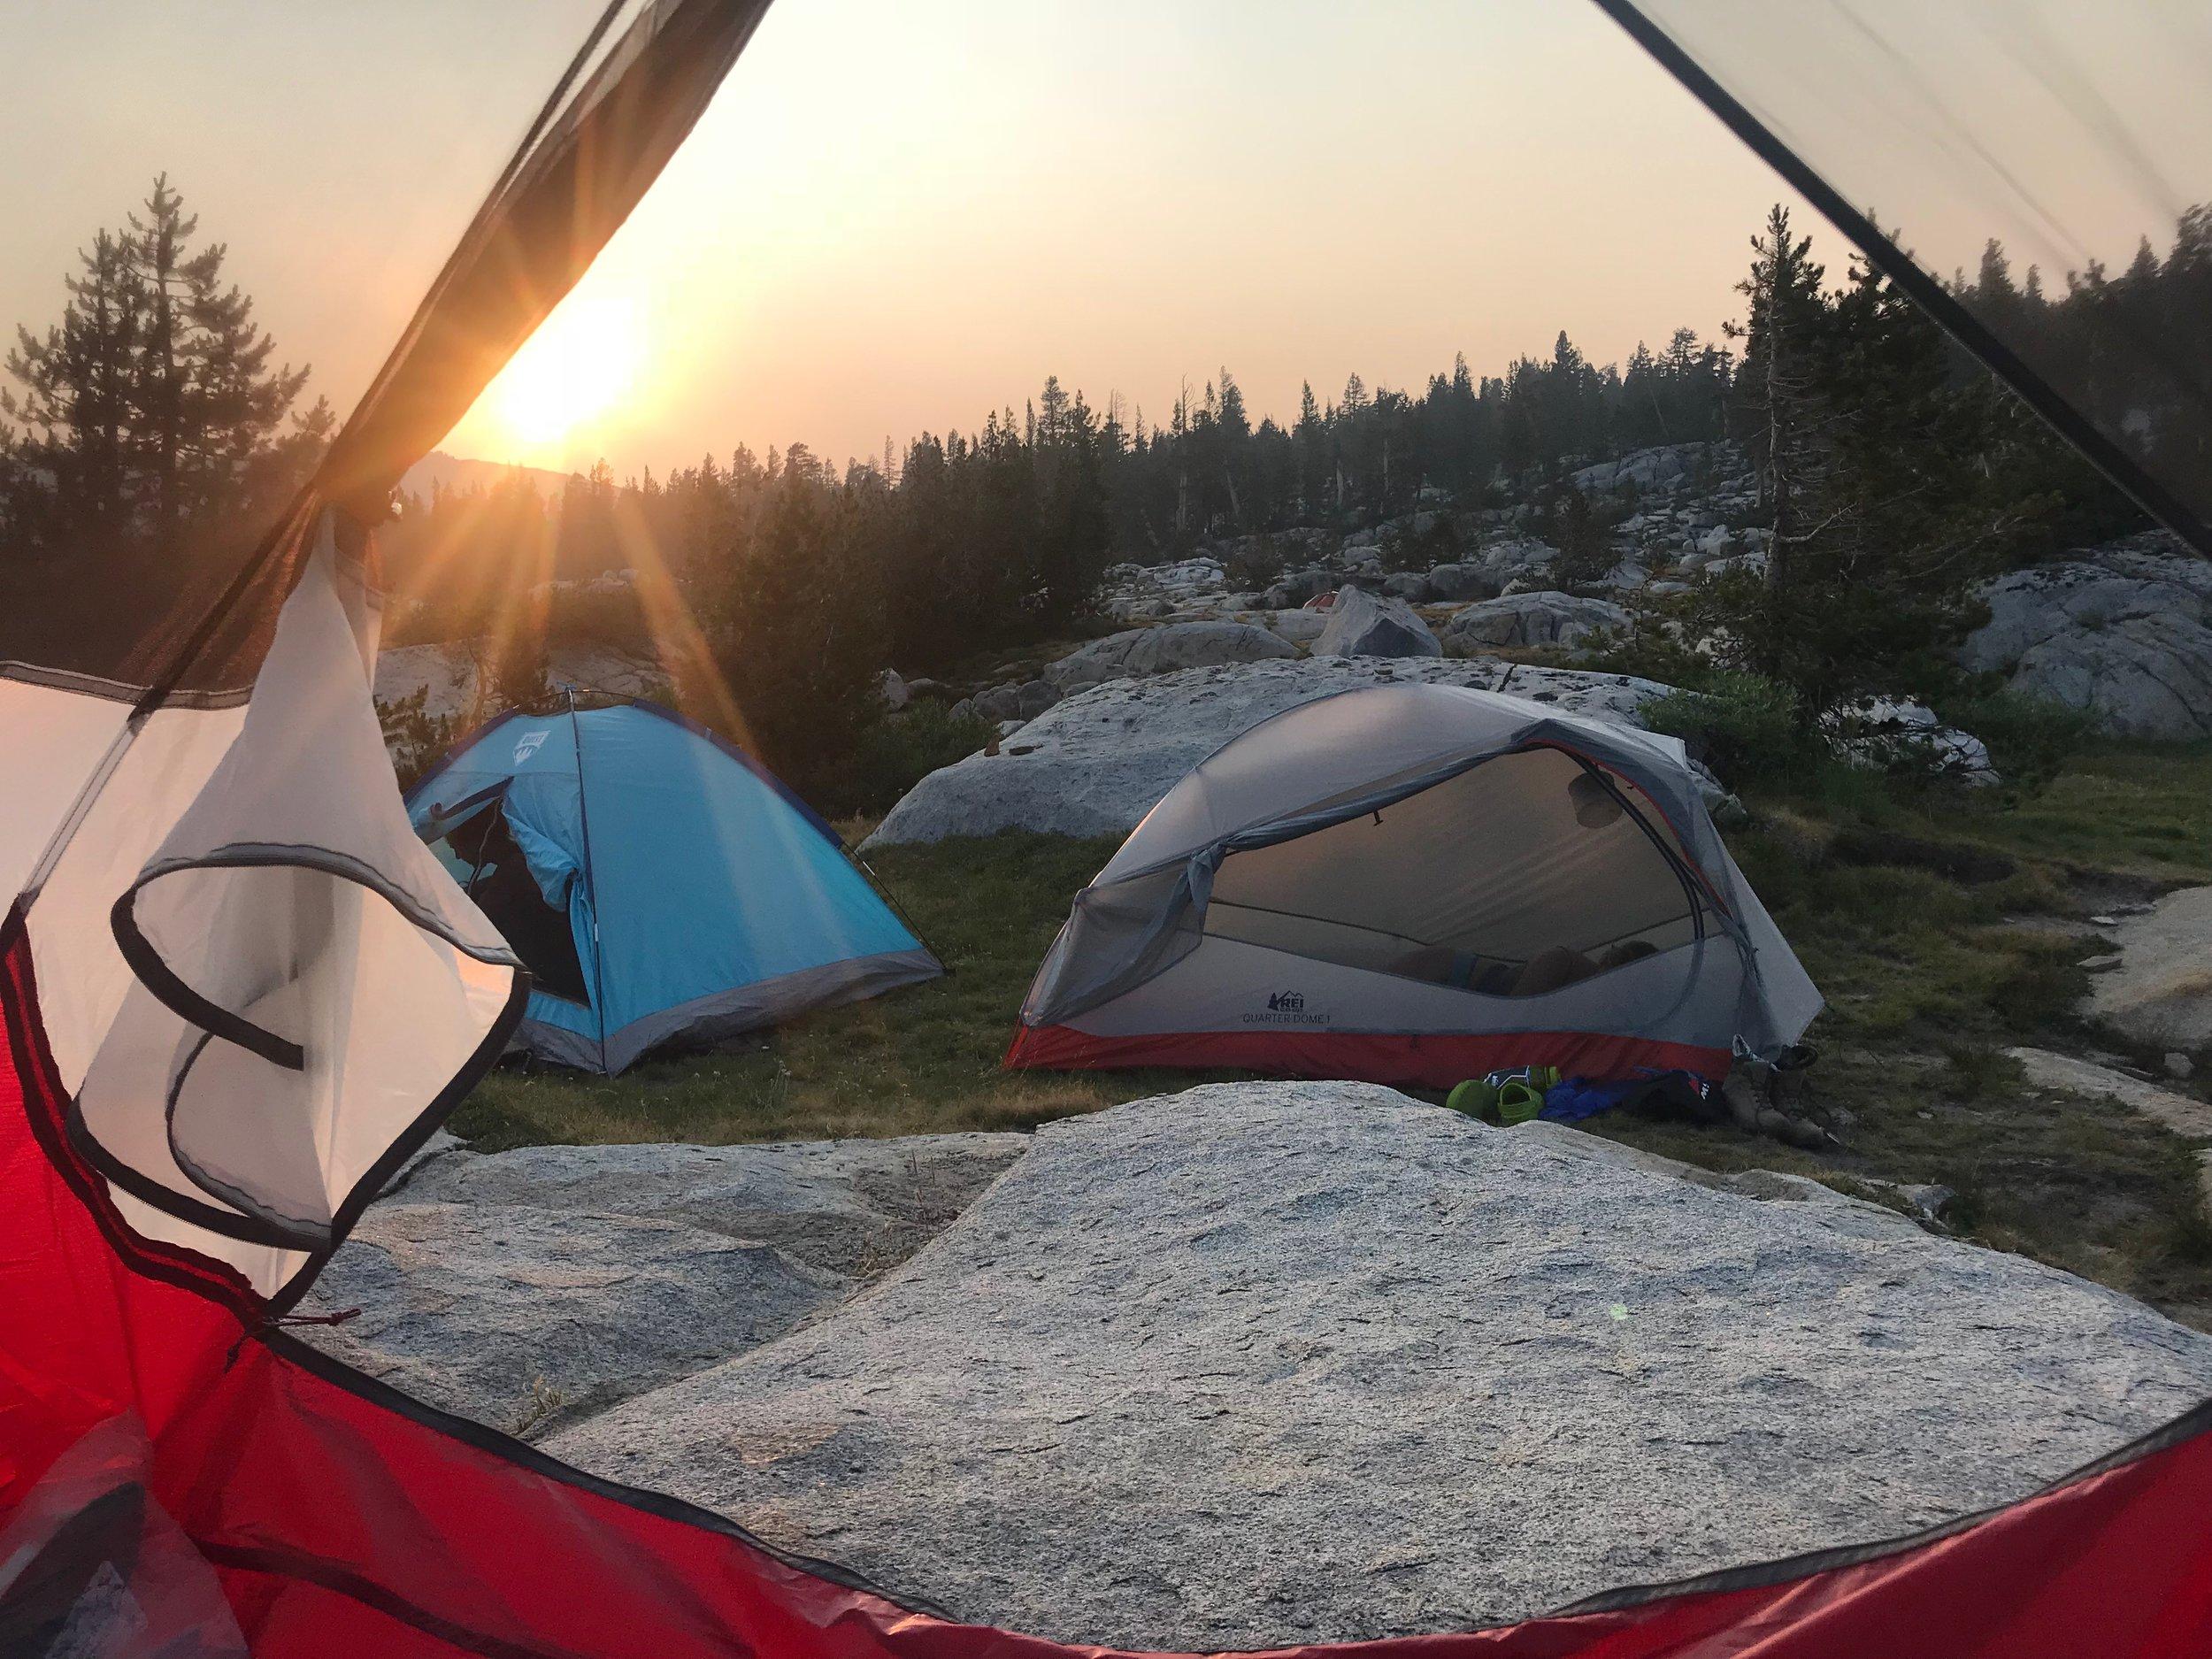 Sunset tent views.